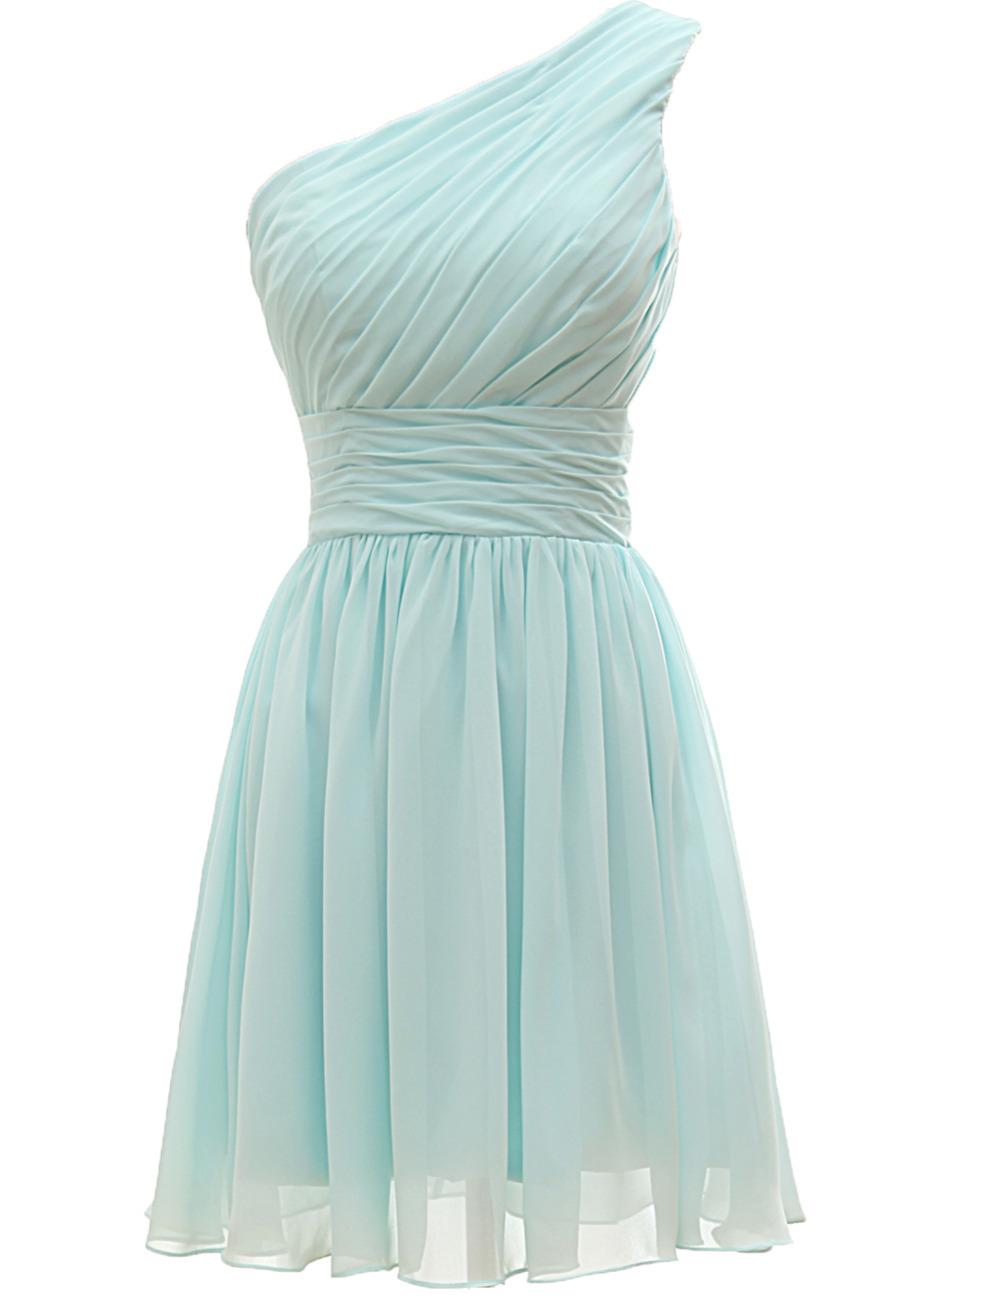 Classic Bridesmaid Dresses One Shoulder Short Wedding Party Dress Cheap Bridesmaid Dress Chiffon Online Discount(China (Mainland))